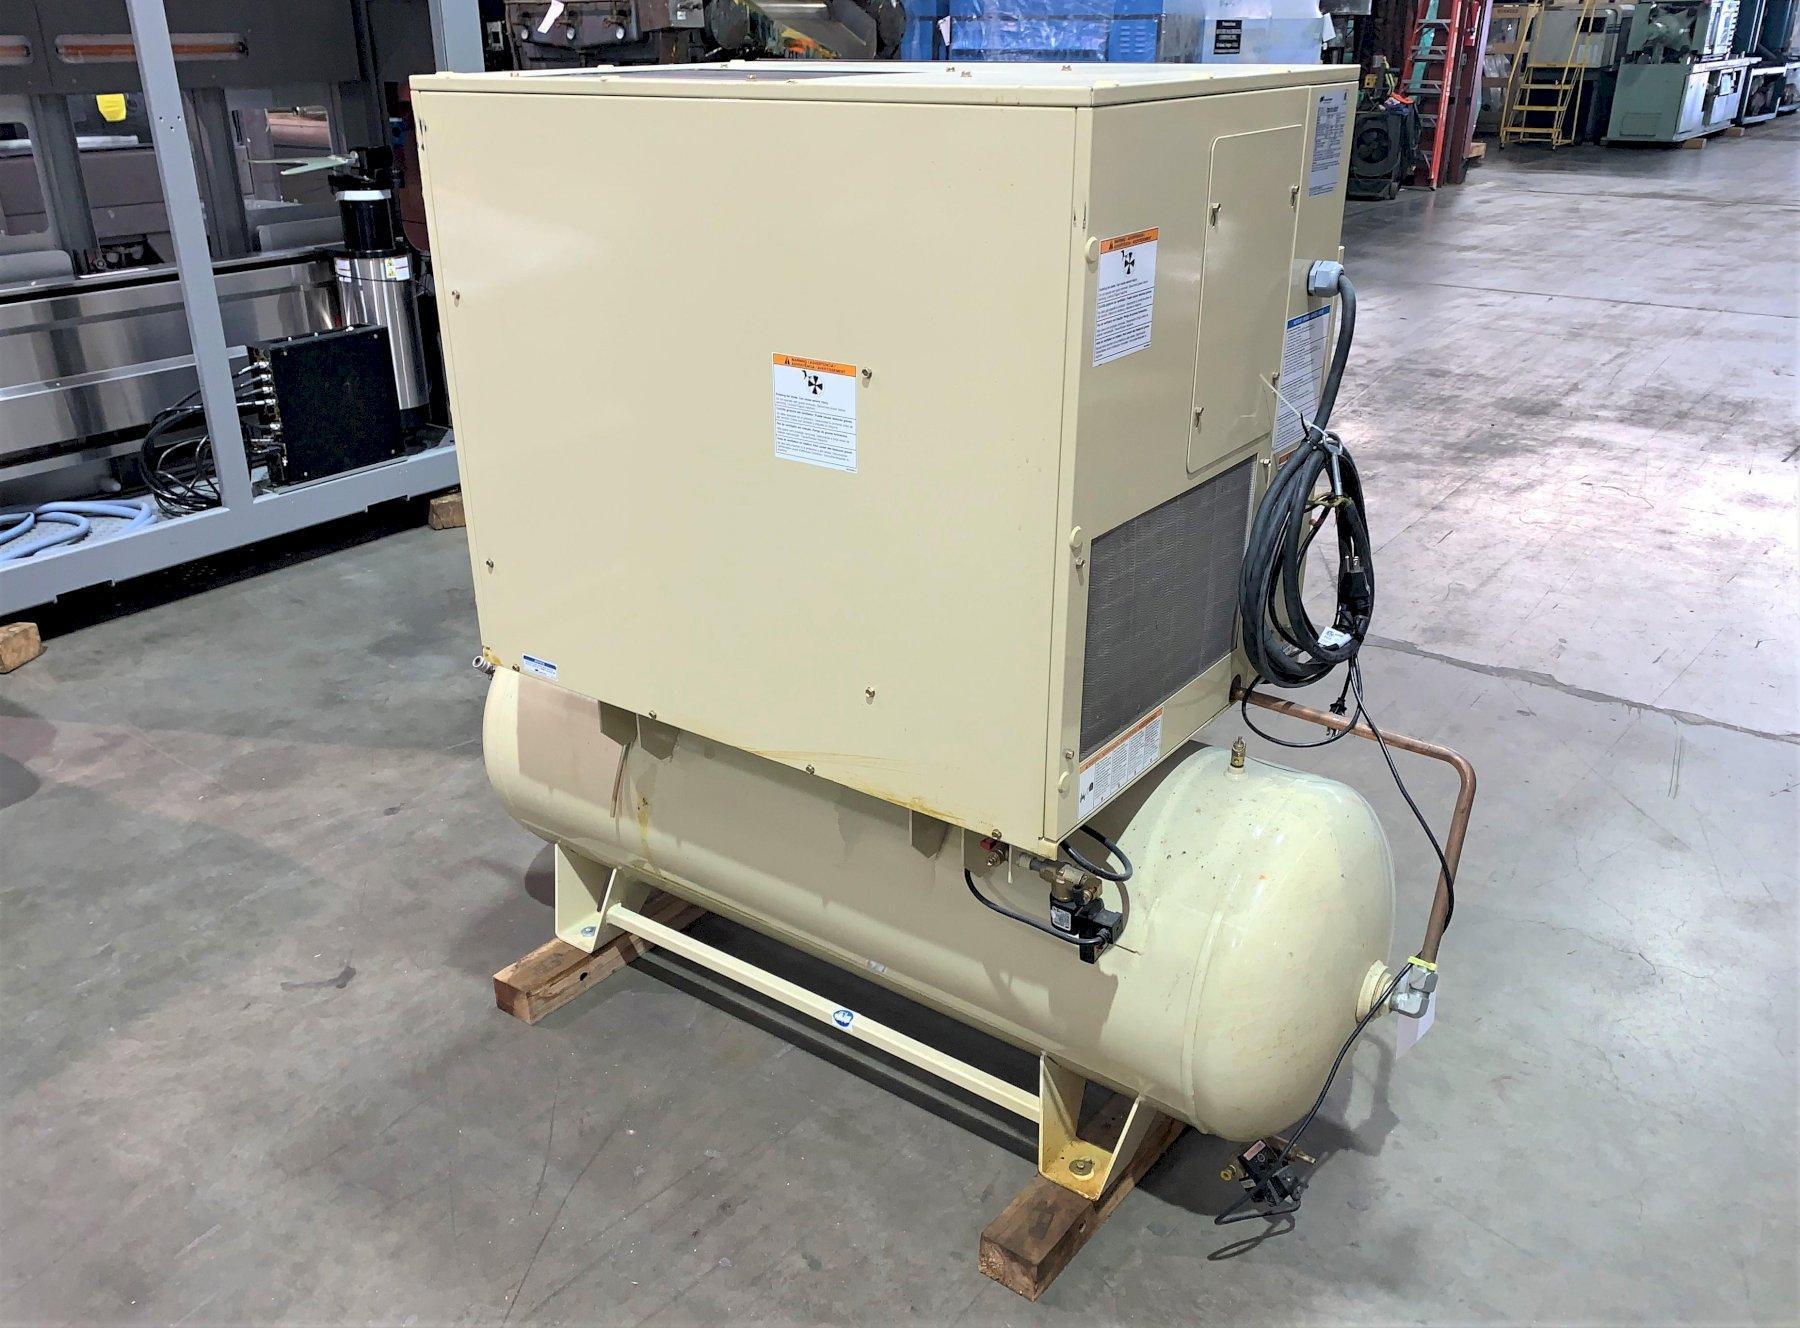 Ingersoll-Rand 15HP Rotary Screw Compressor